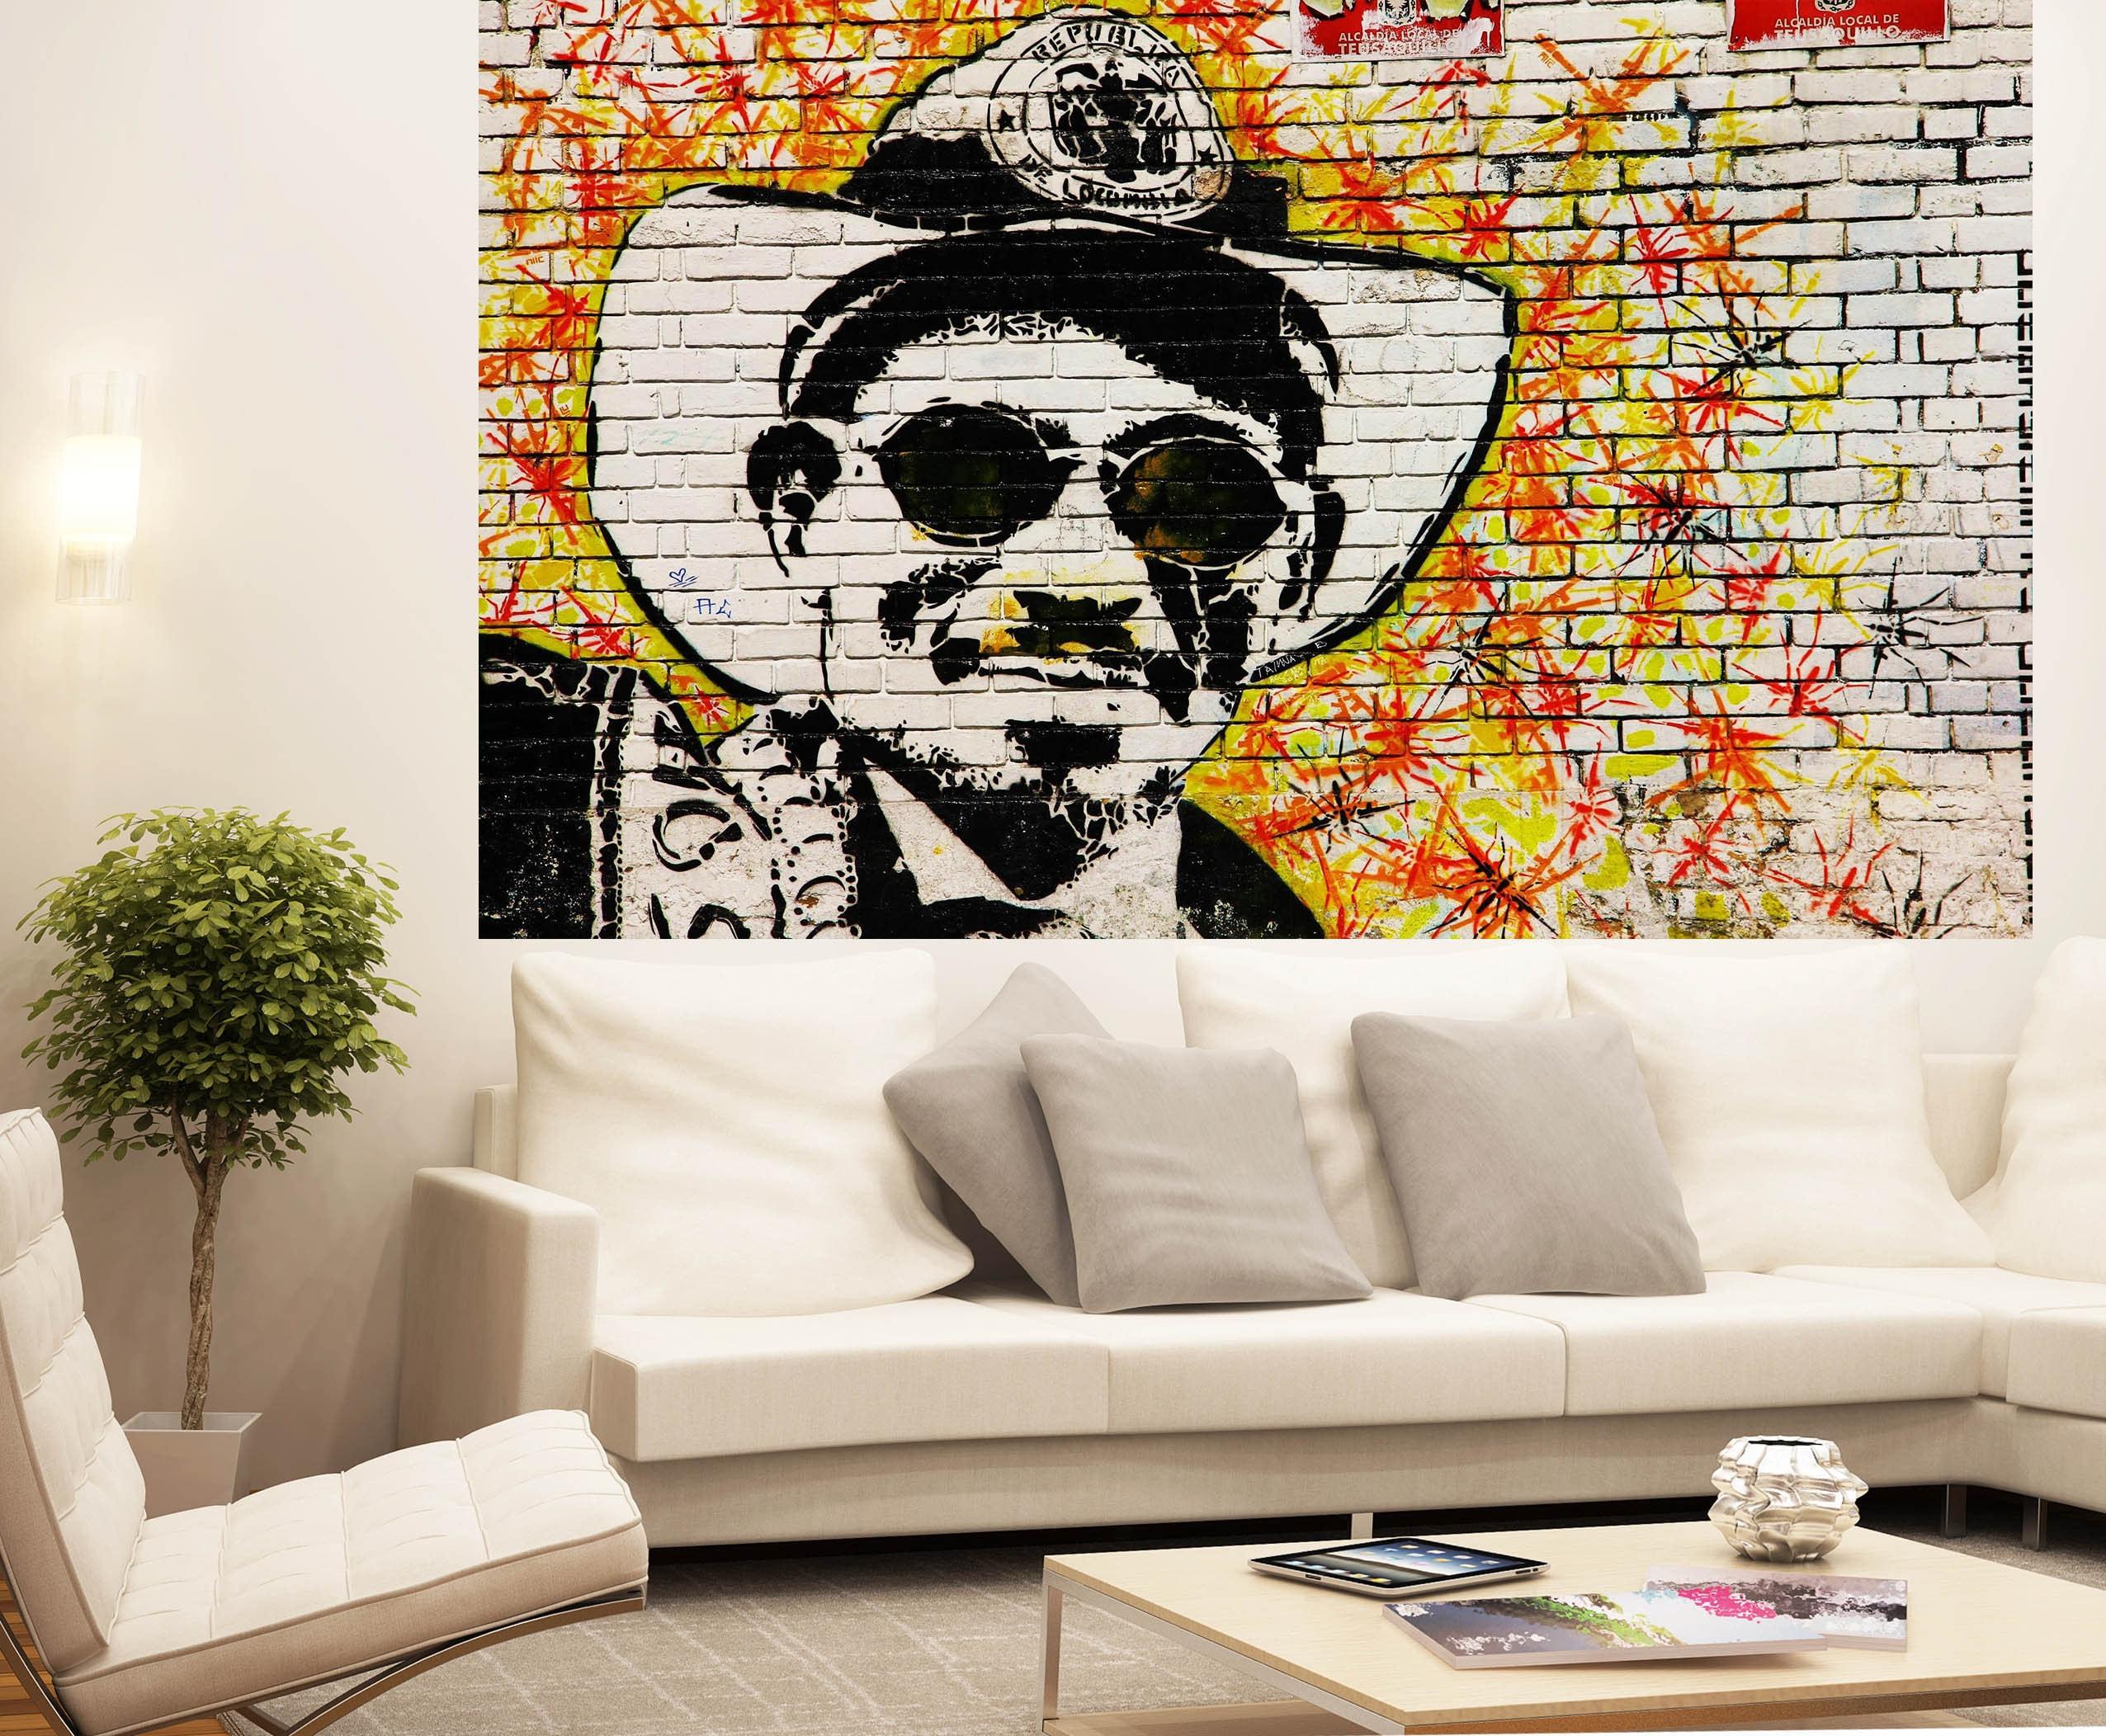 graffiti wall urban street art PRINT  a1 size CANVAS Australia painting